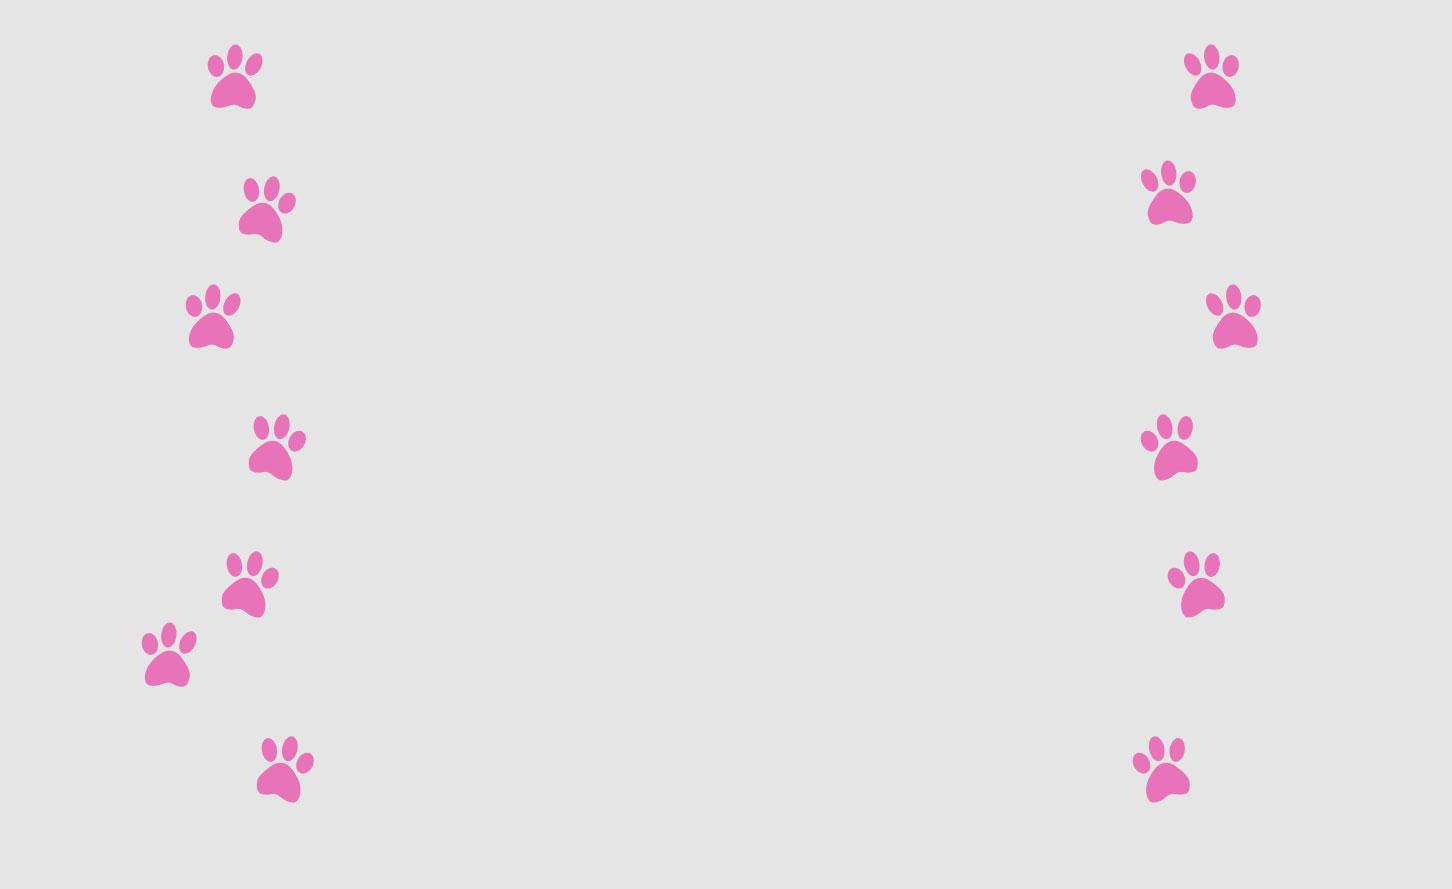 pink panther Fonds dcran Arrires plan 1452x889 ID429927 1452x889